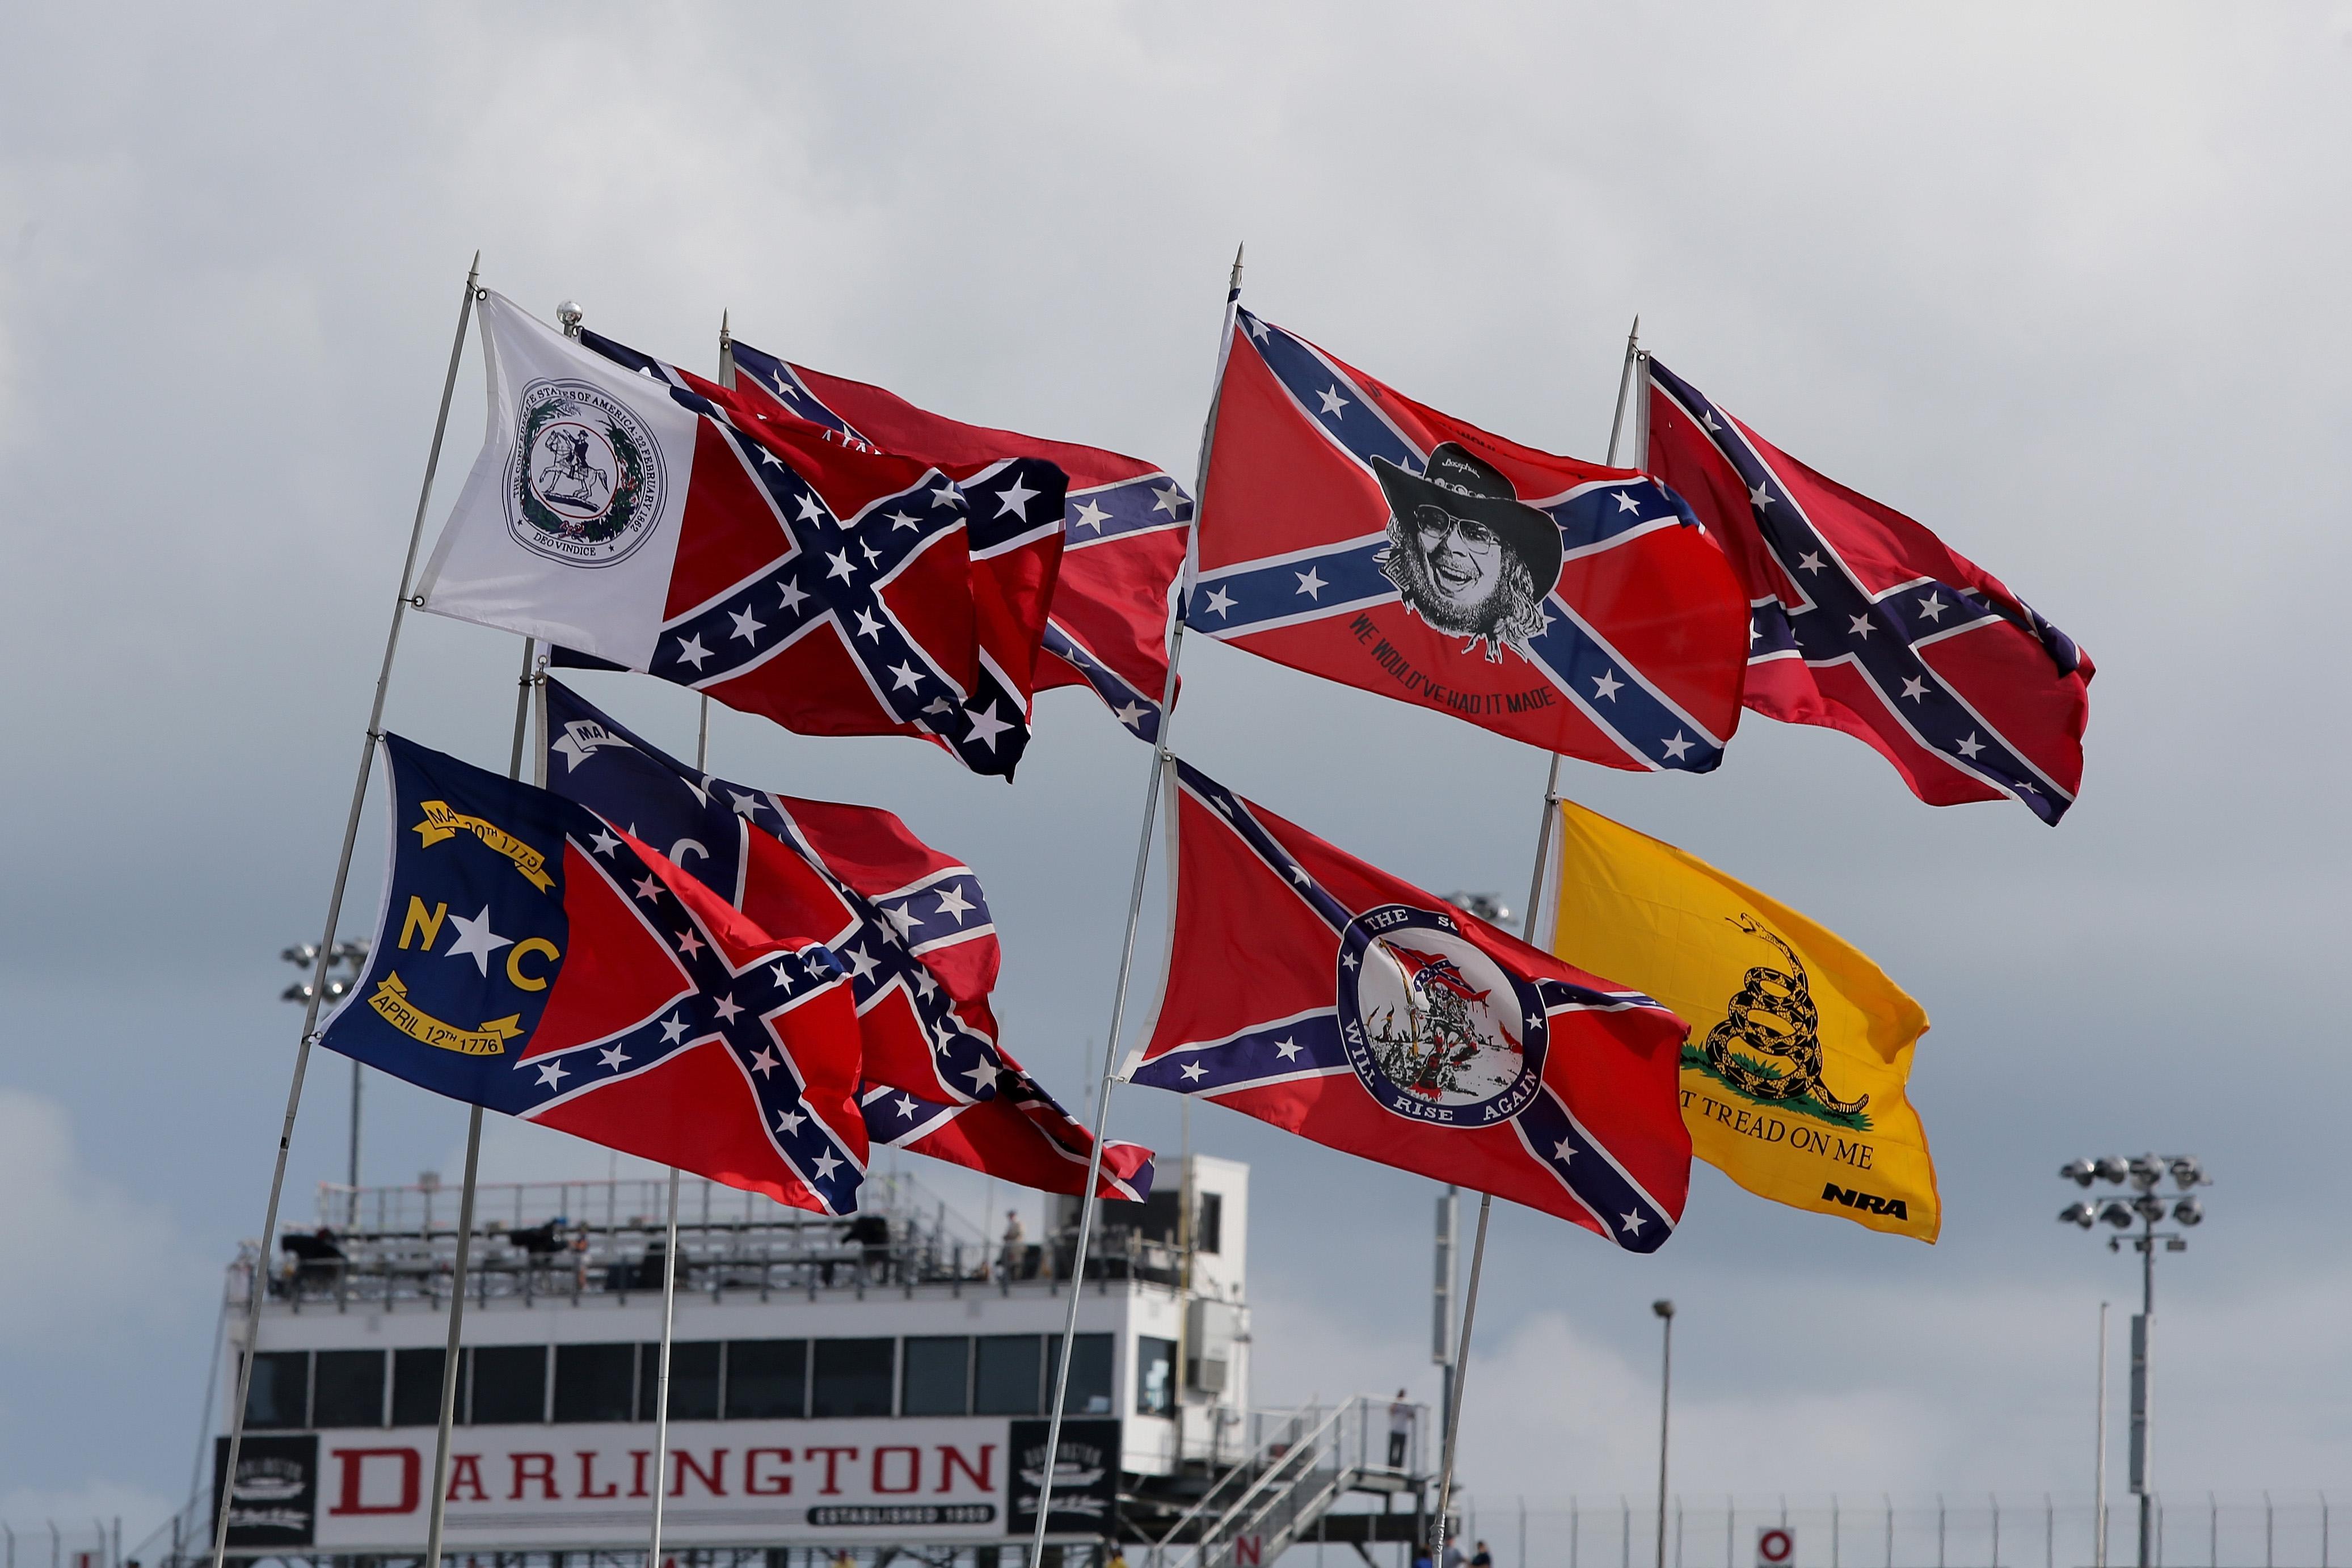 NASCAR's Confederate flag conundrum